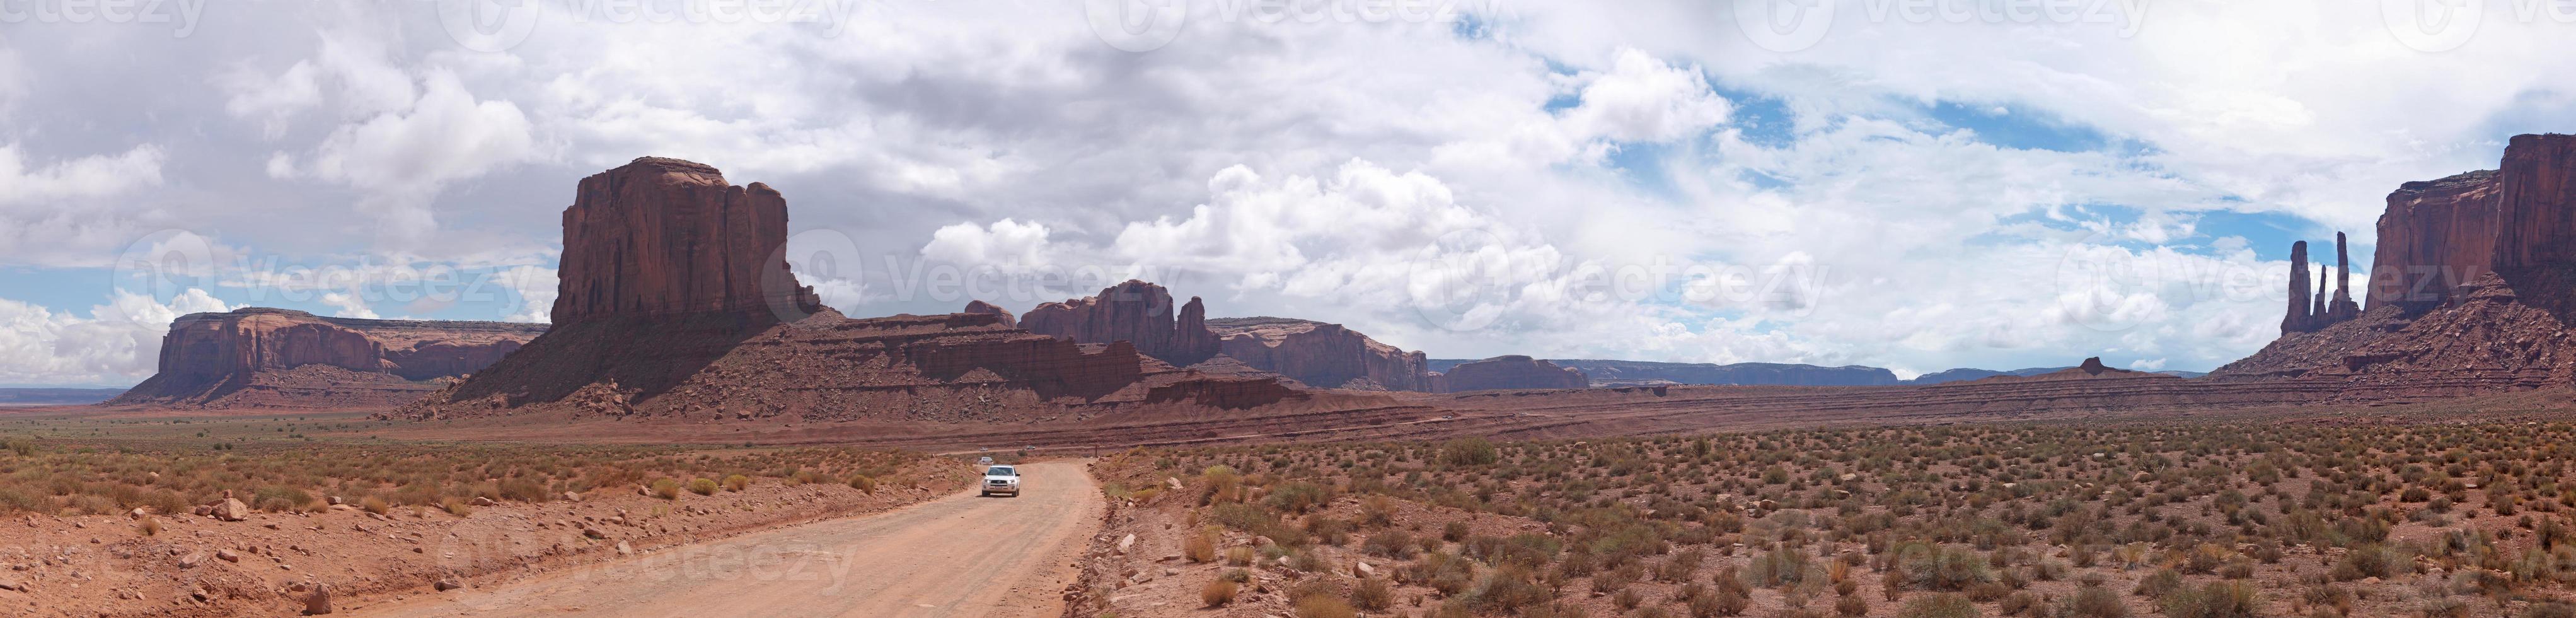 panorama do vale do monumento foto